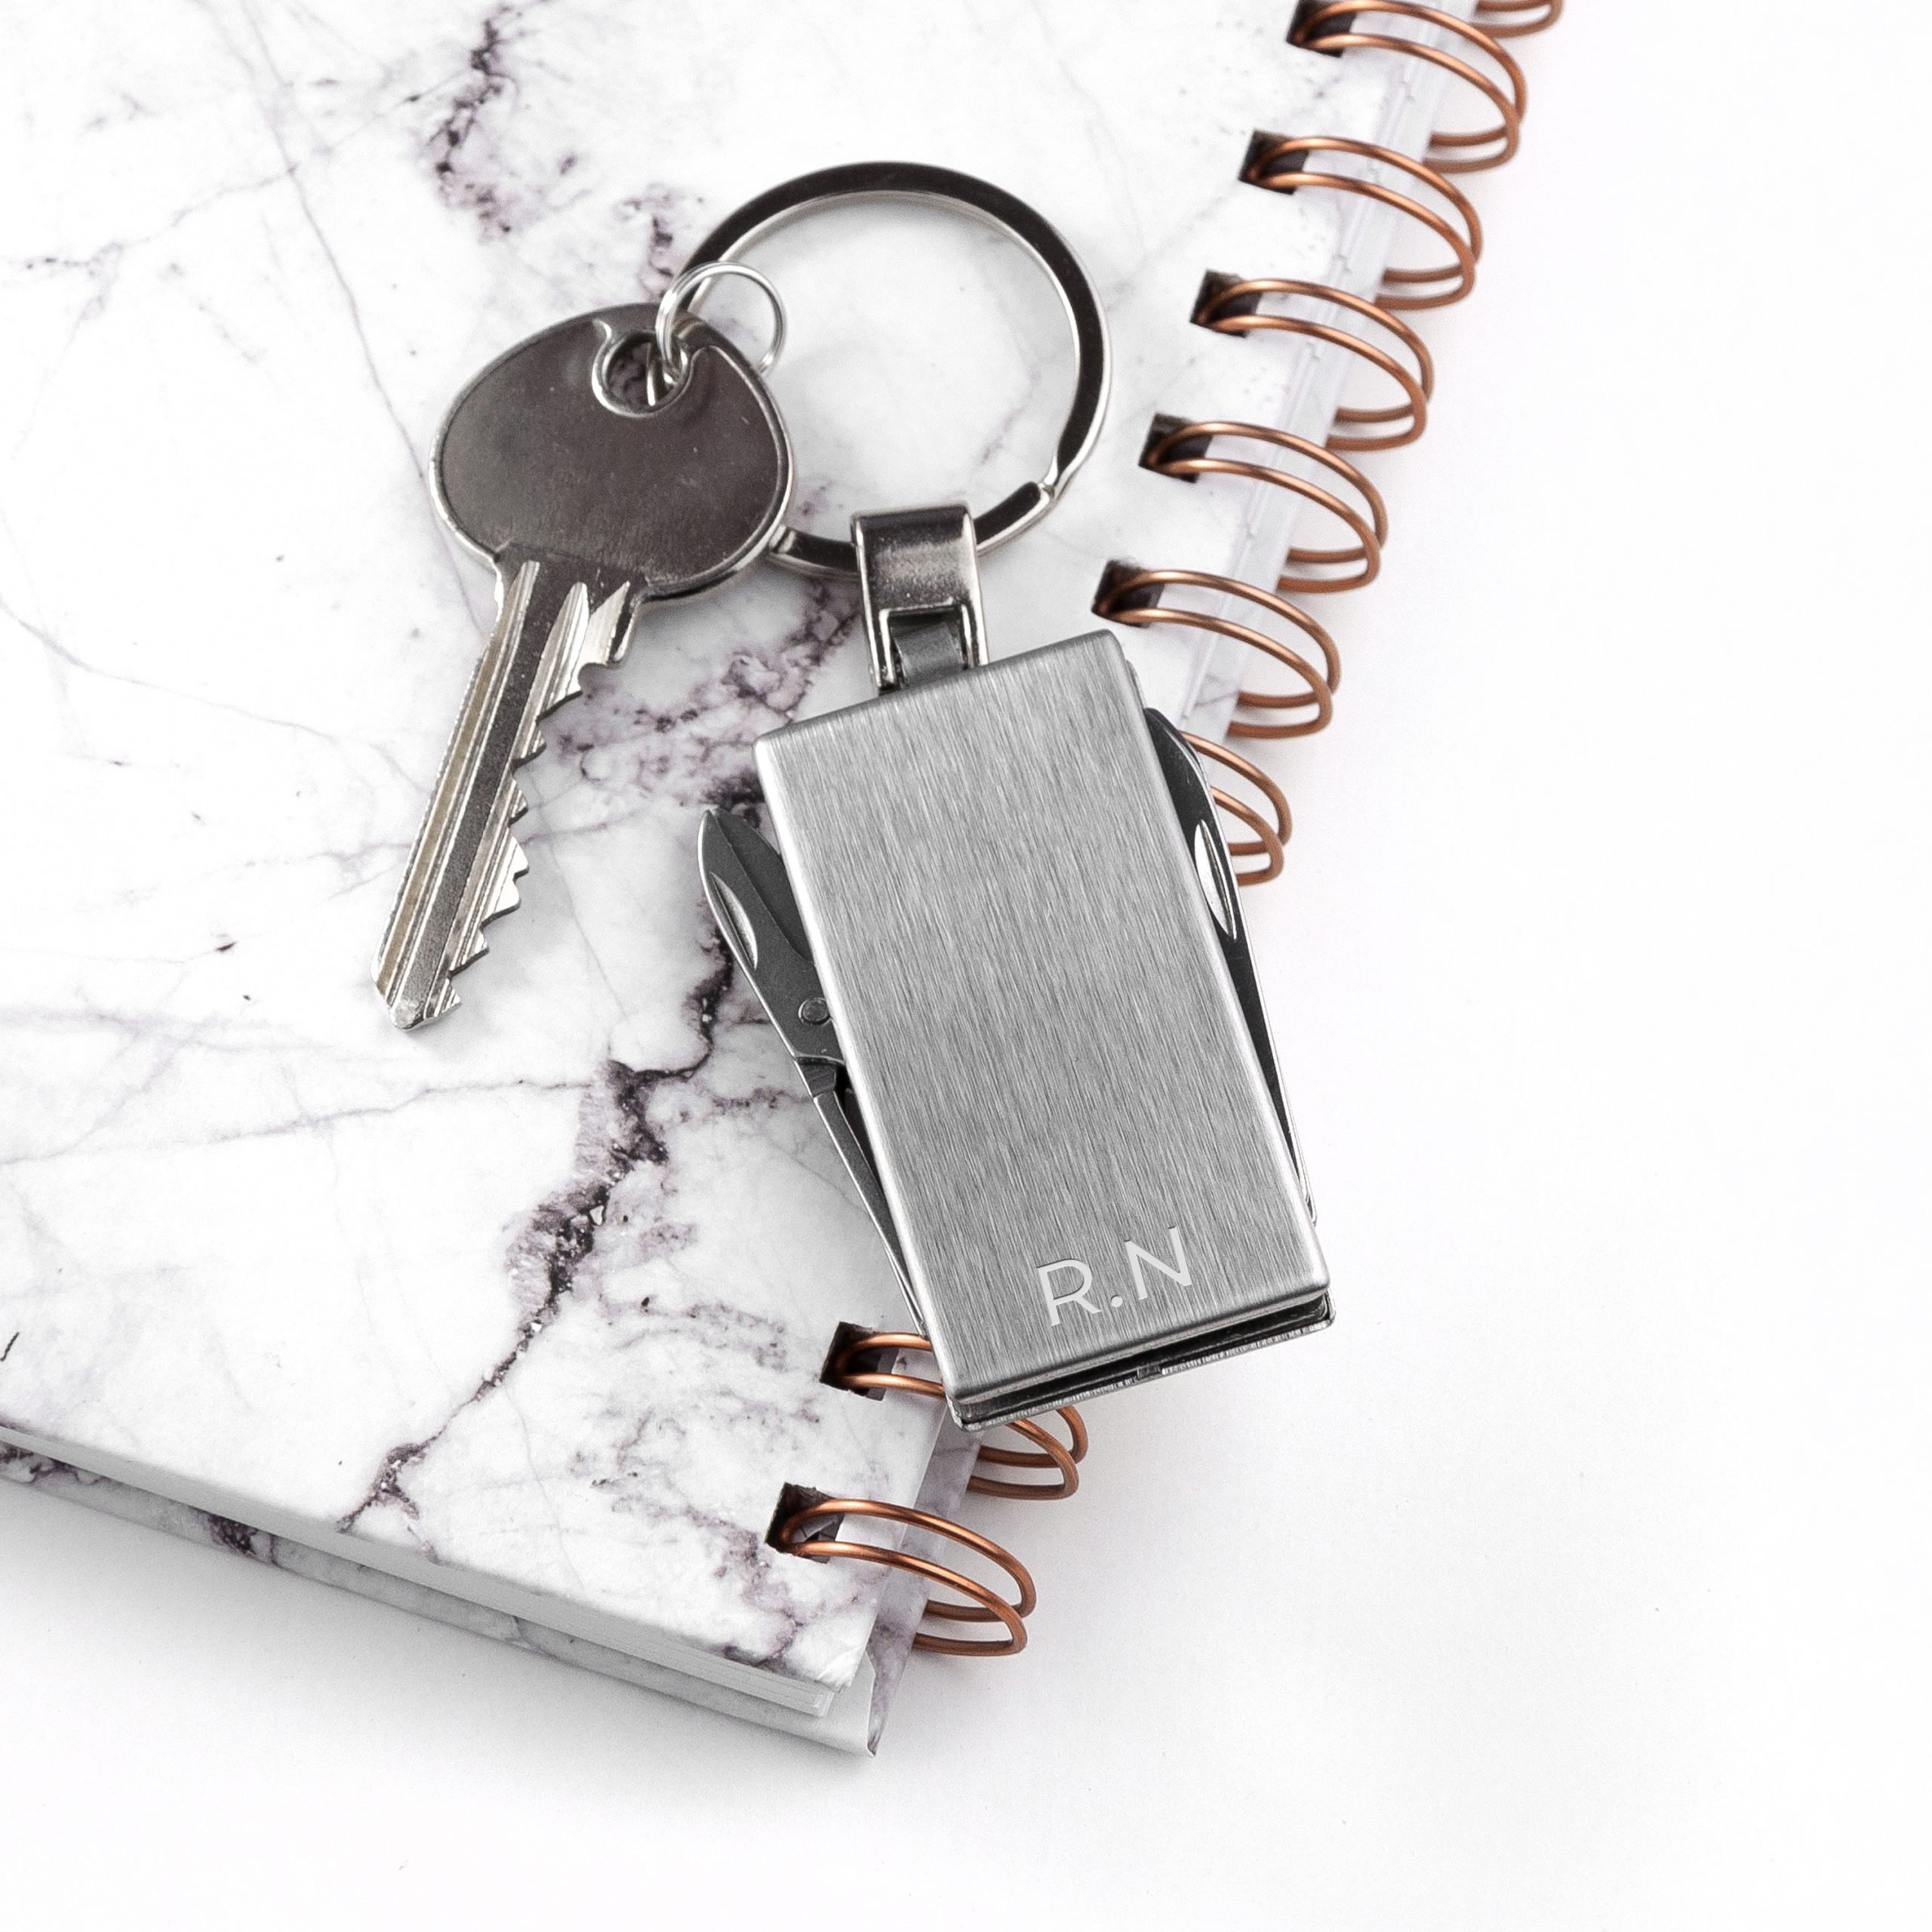 Personalised Multitool Key Ring